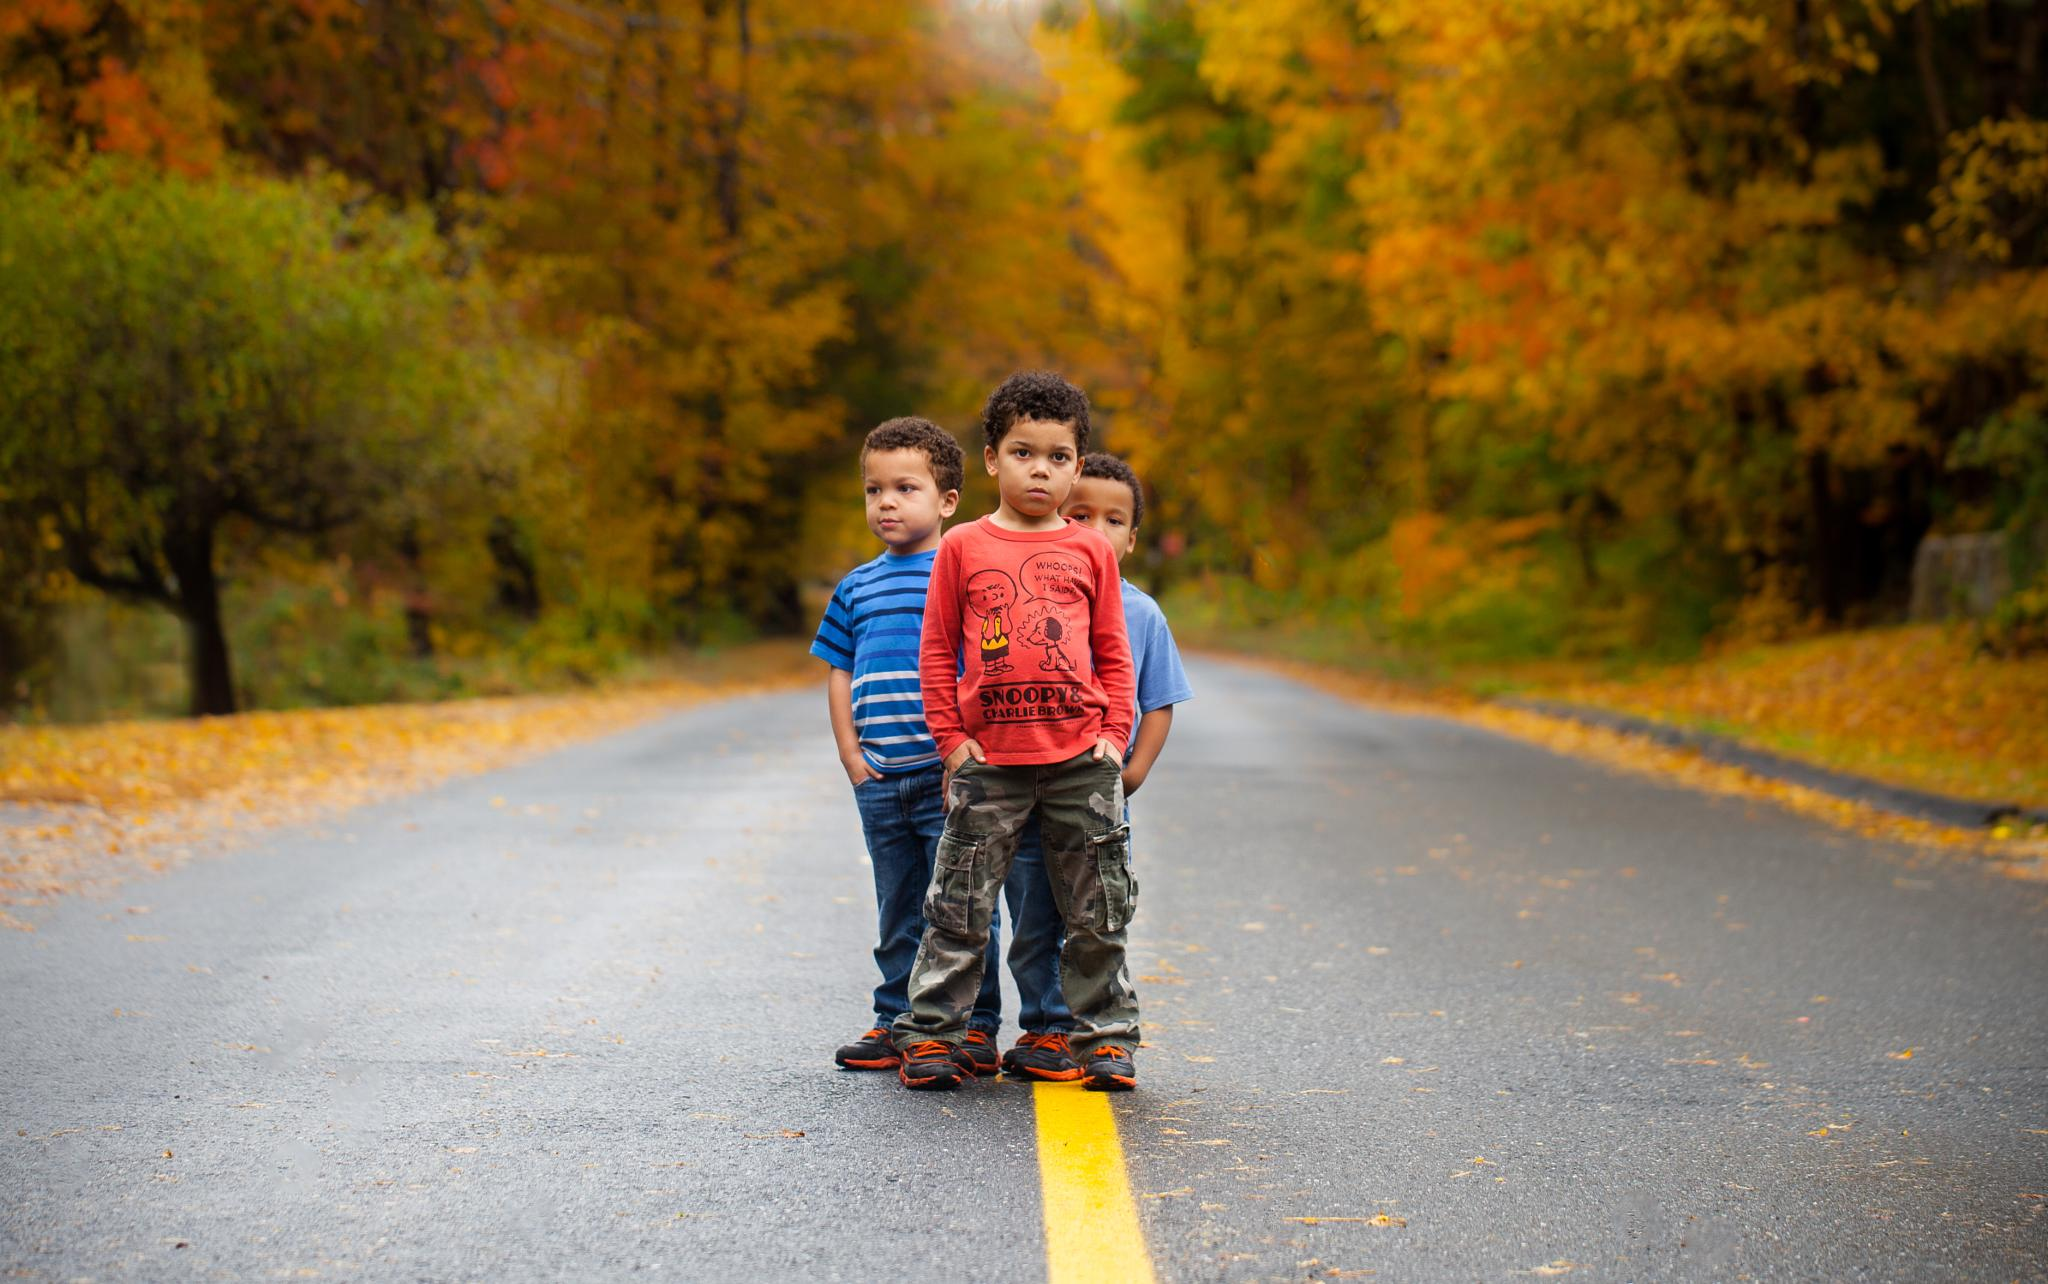 Street Kids by keith.roselle